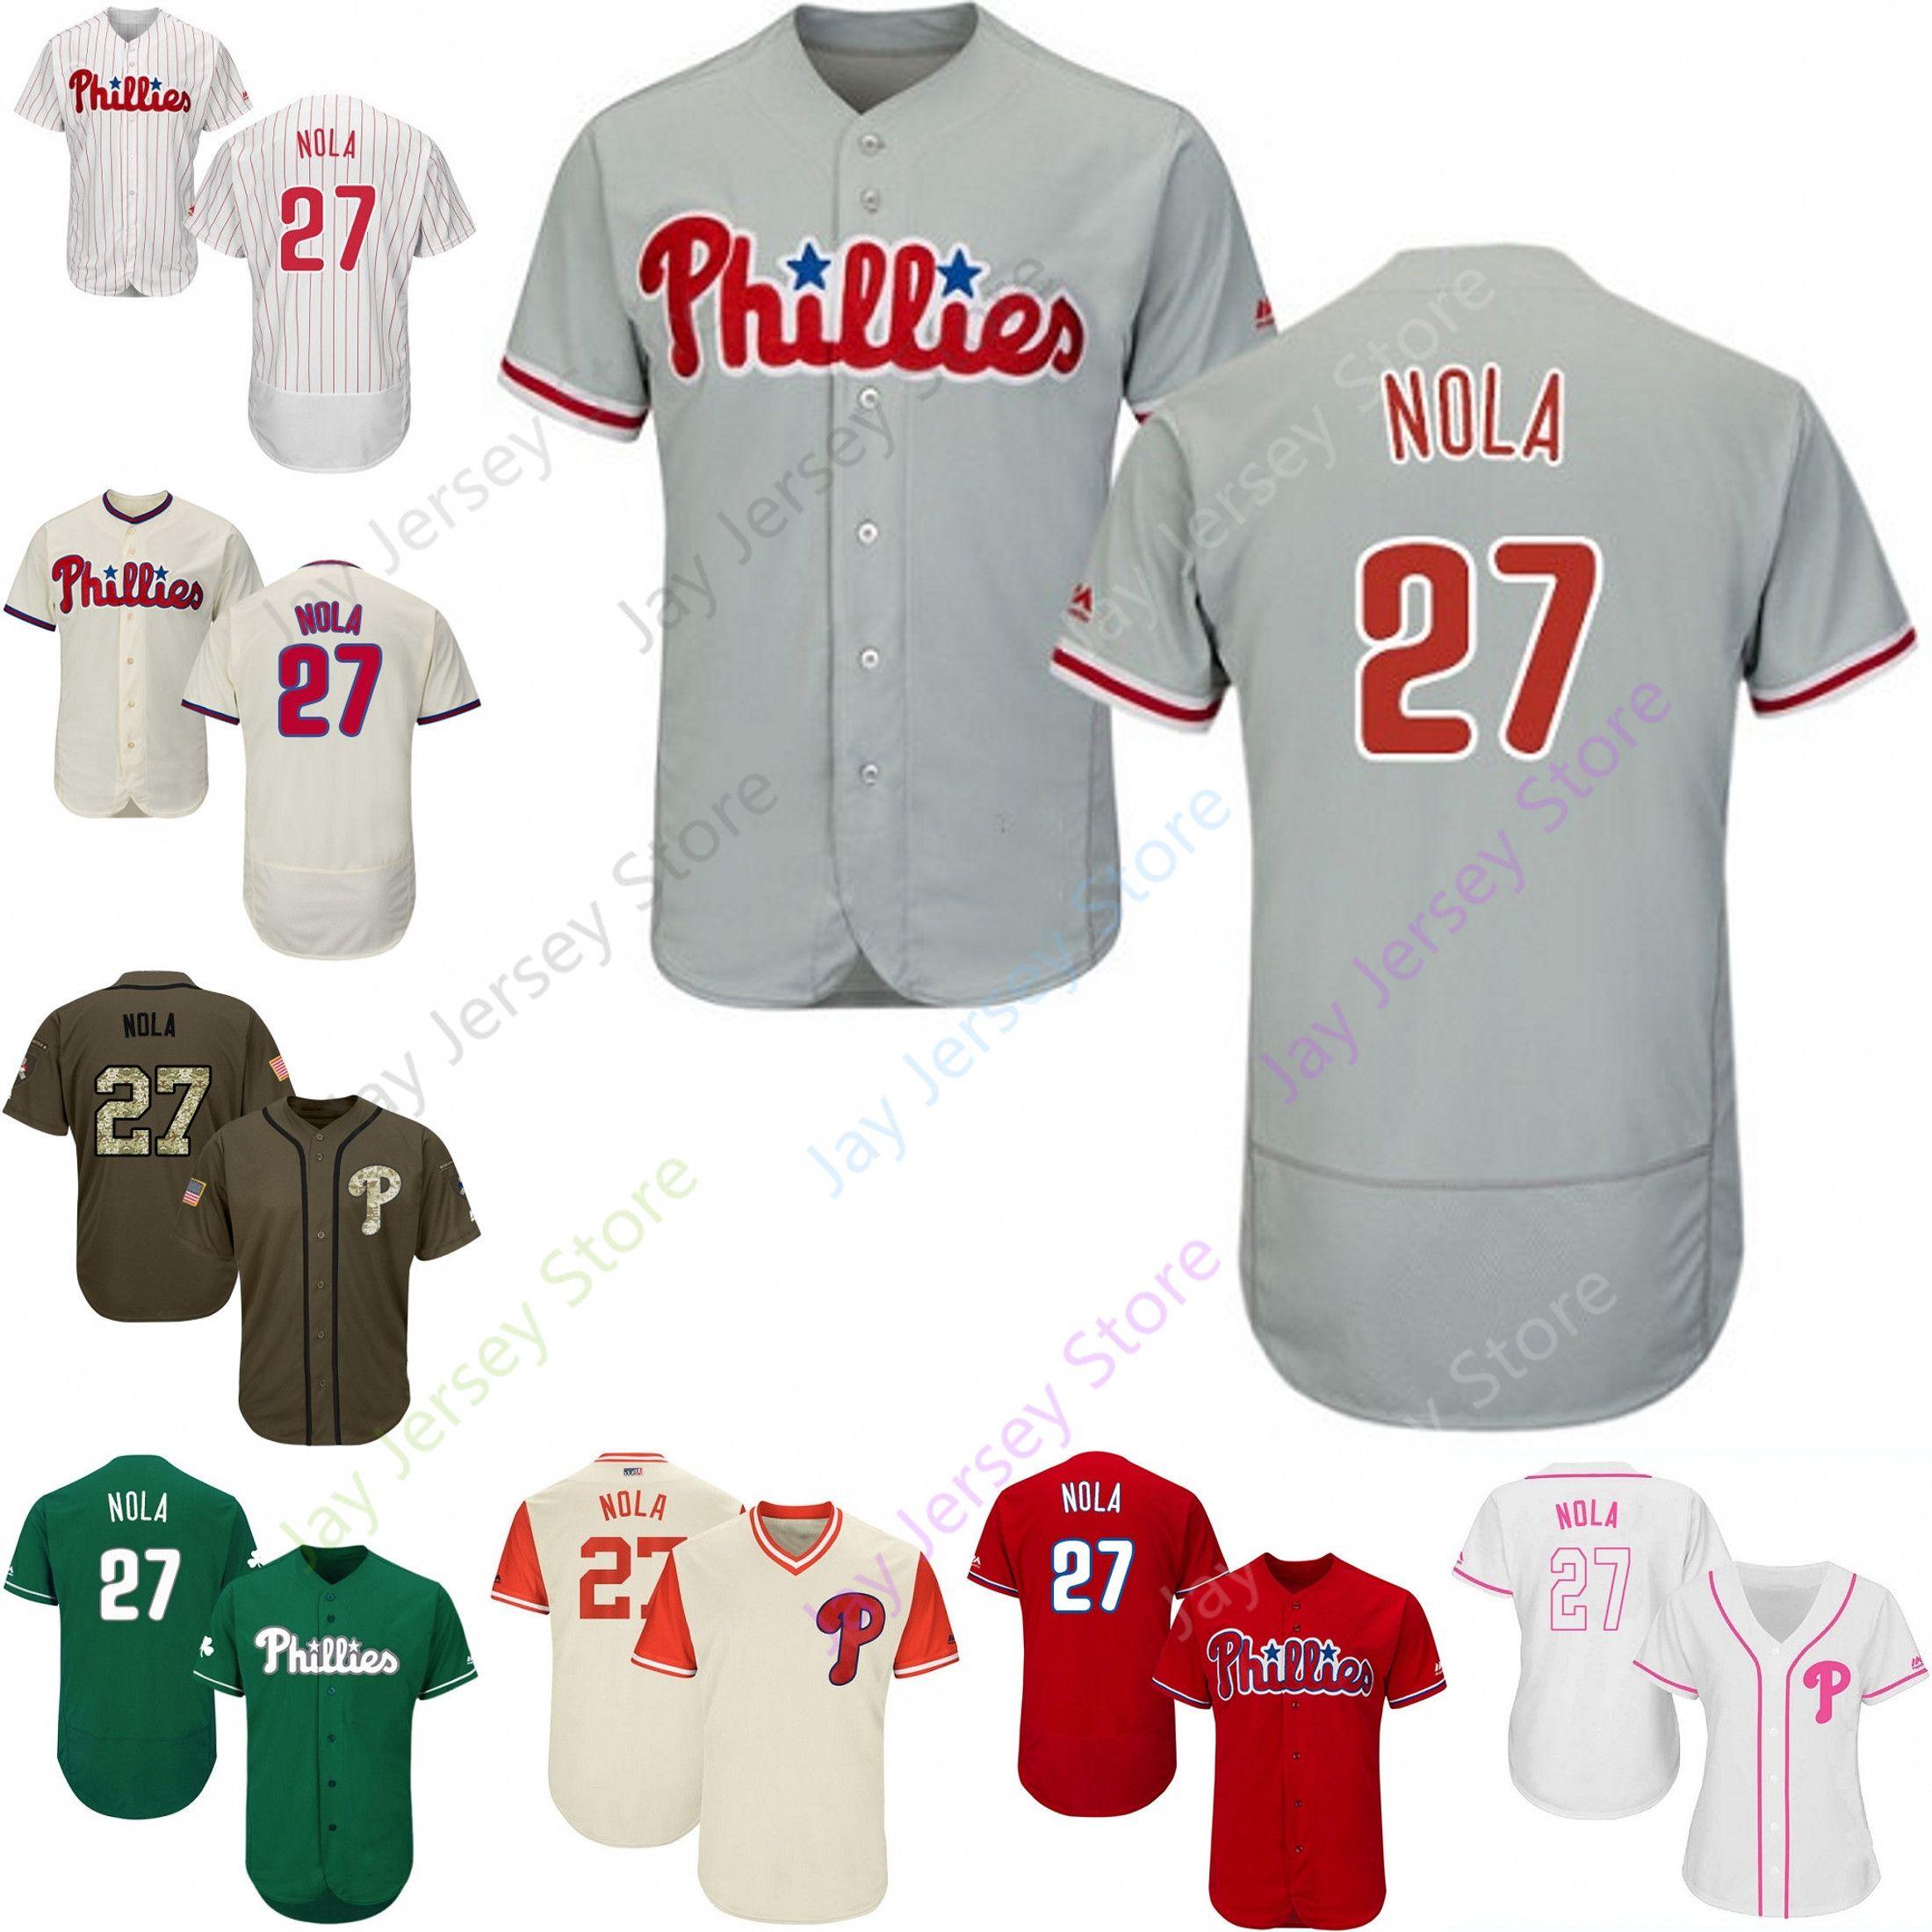 check out 56a1a 3ed9e 2019 Philadelphia 27 Aaron Nola Jersey Phillies Jerseys Cool Base Flexbase  Home Away White Black Red Grey Pullover Button Men Women Youth